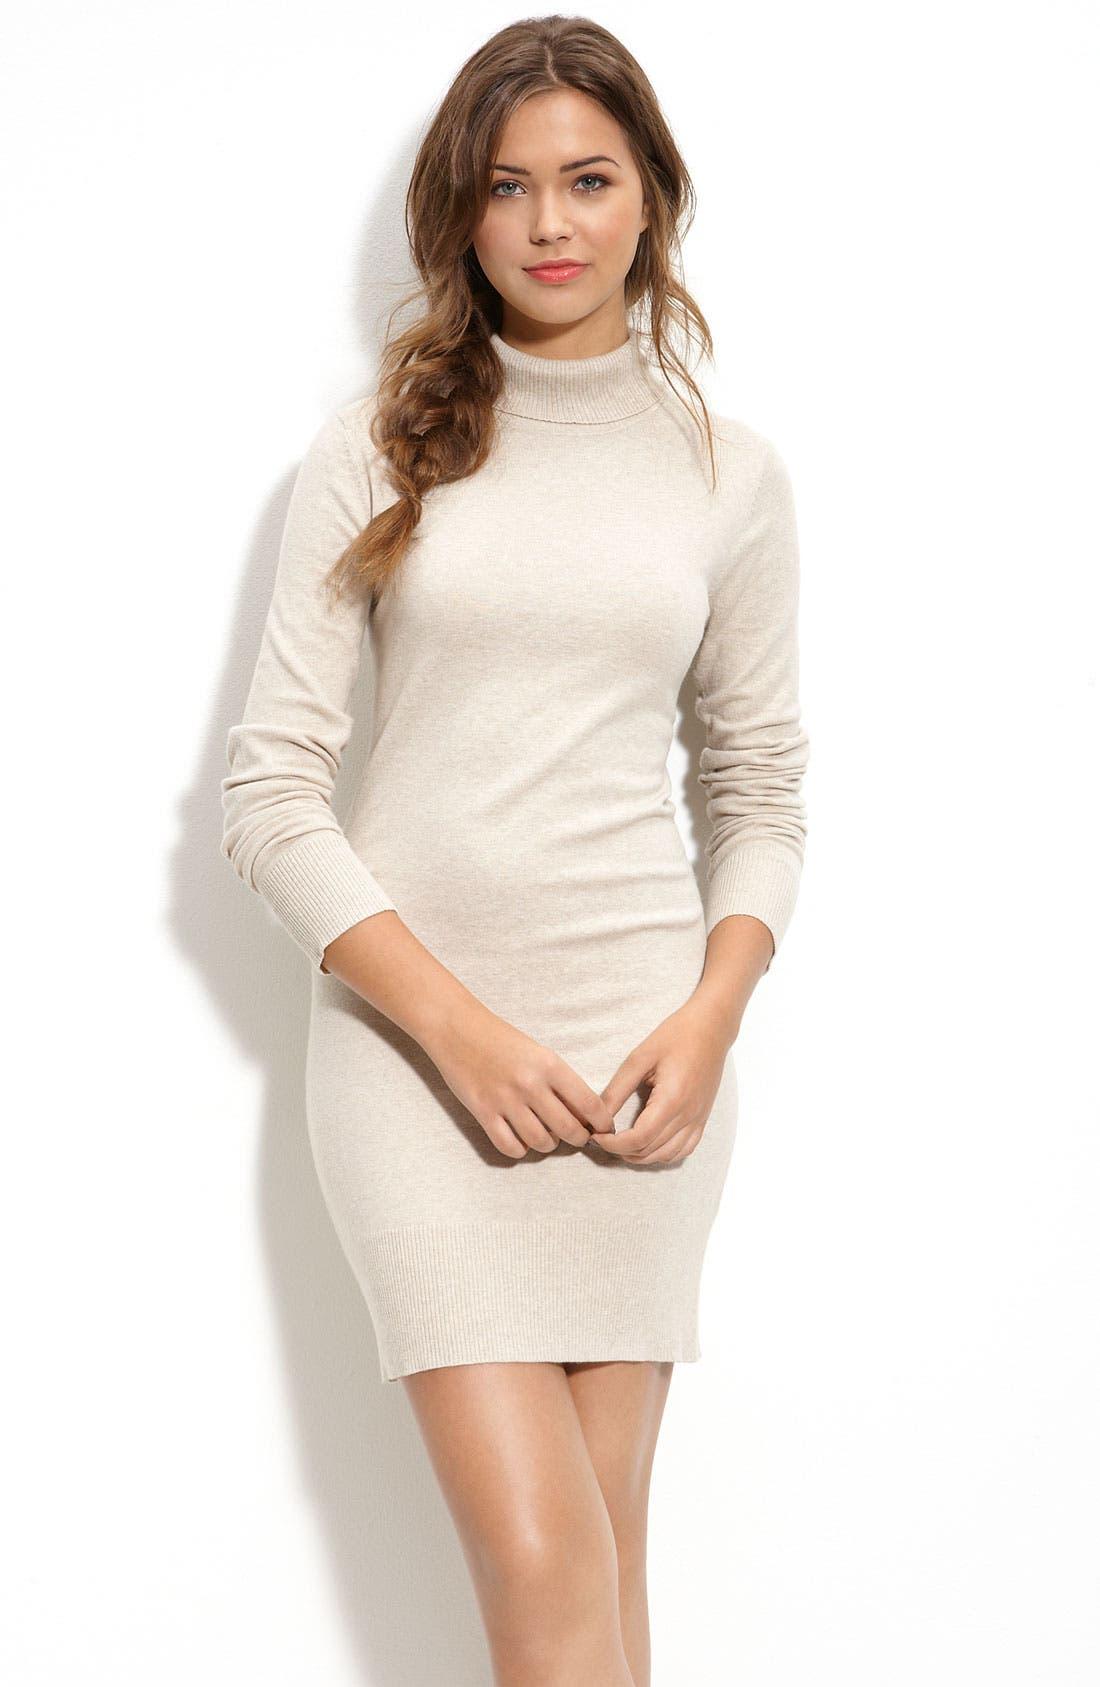 Alternate Image 1 Selected - Frenchi® Turtleneck Sweater Dress (Juniors)